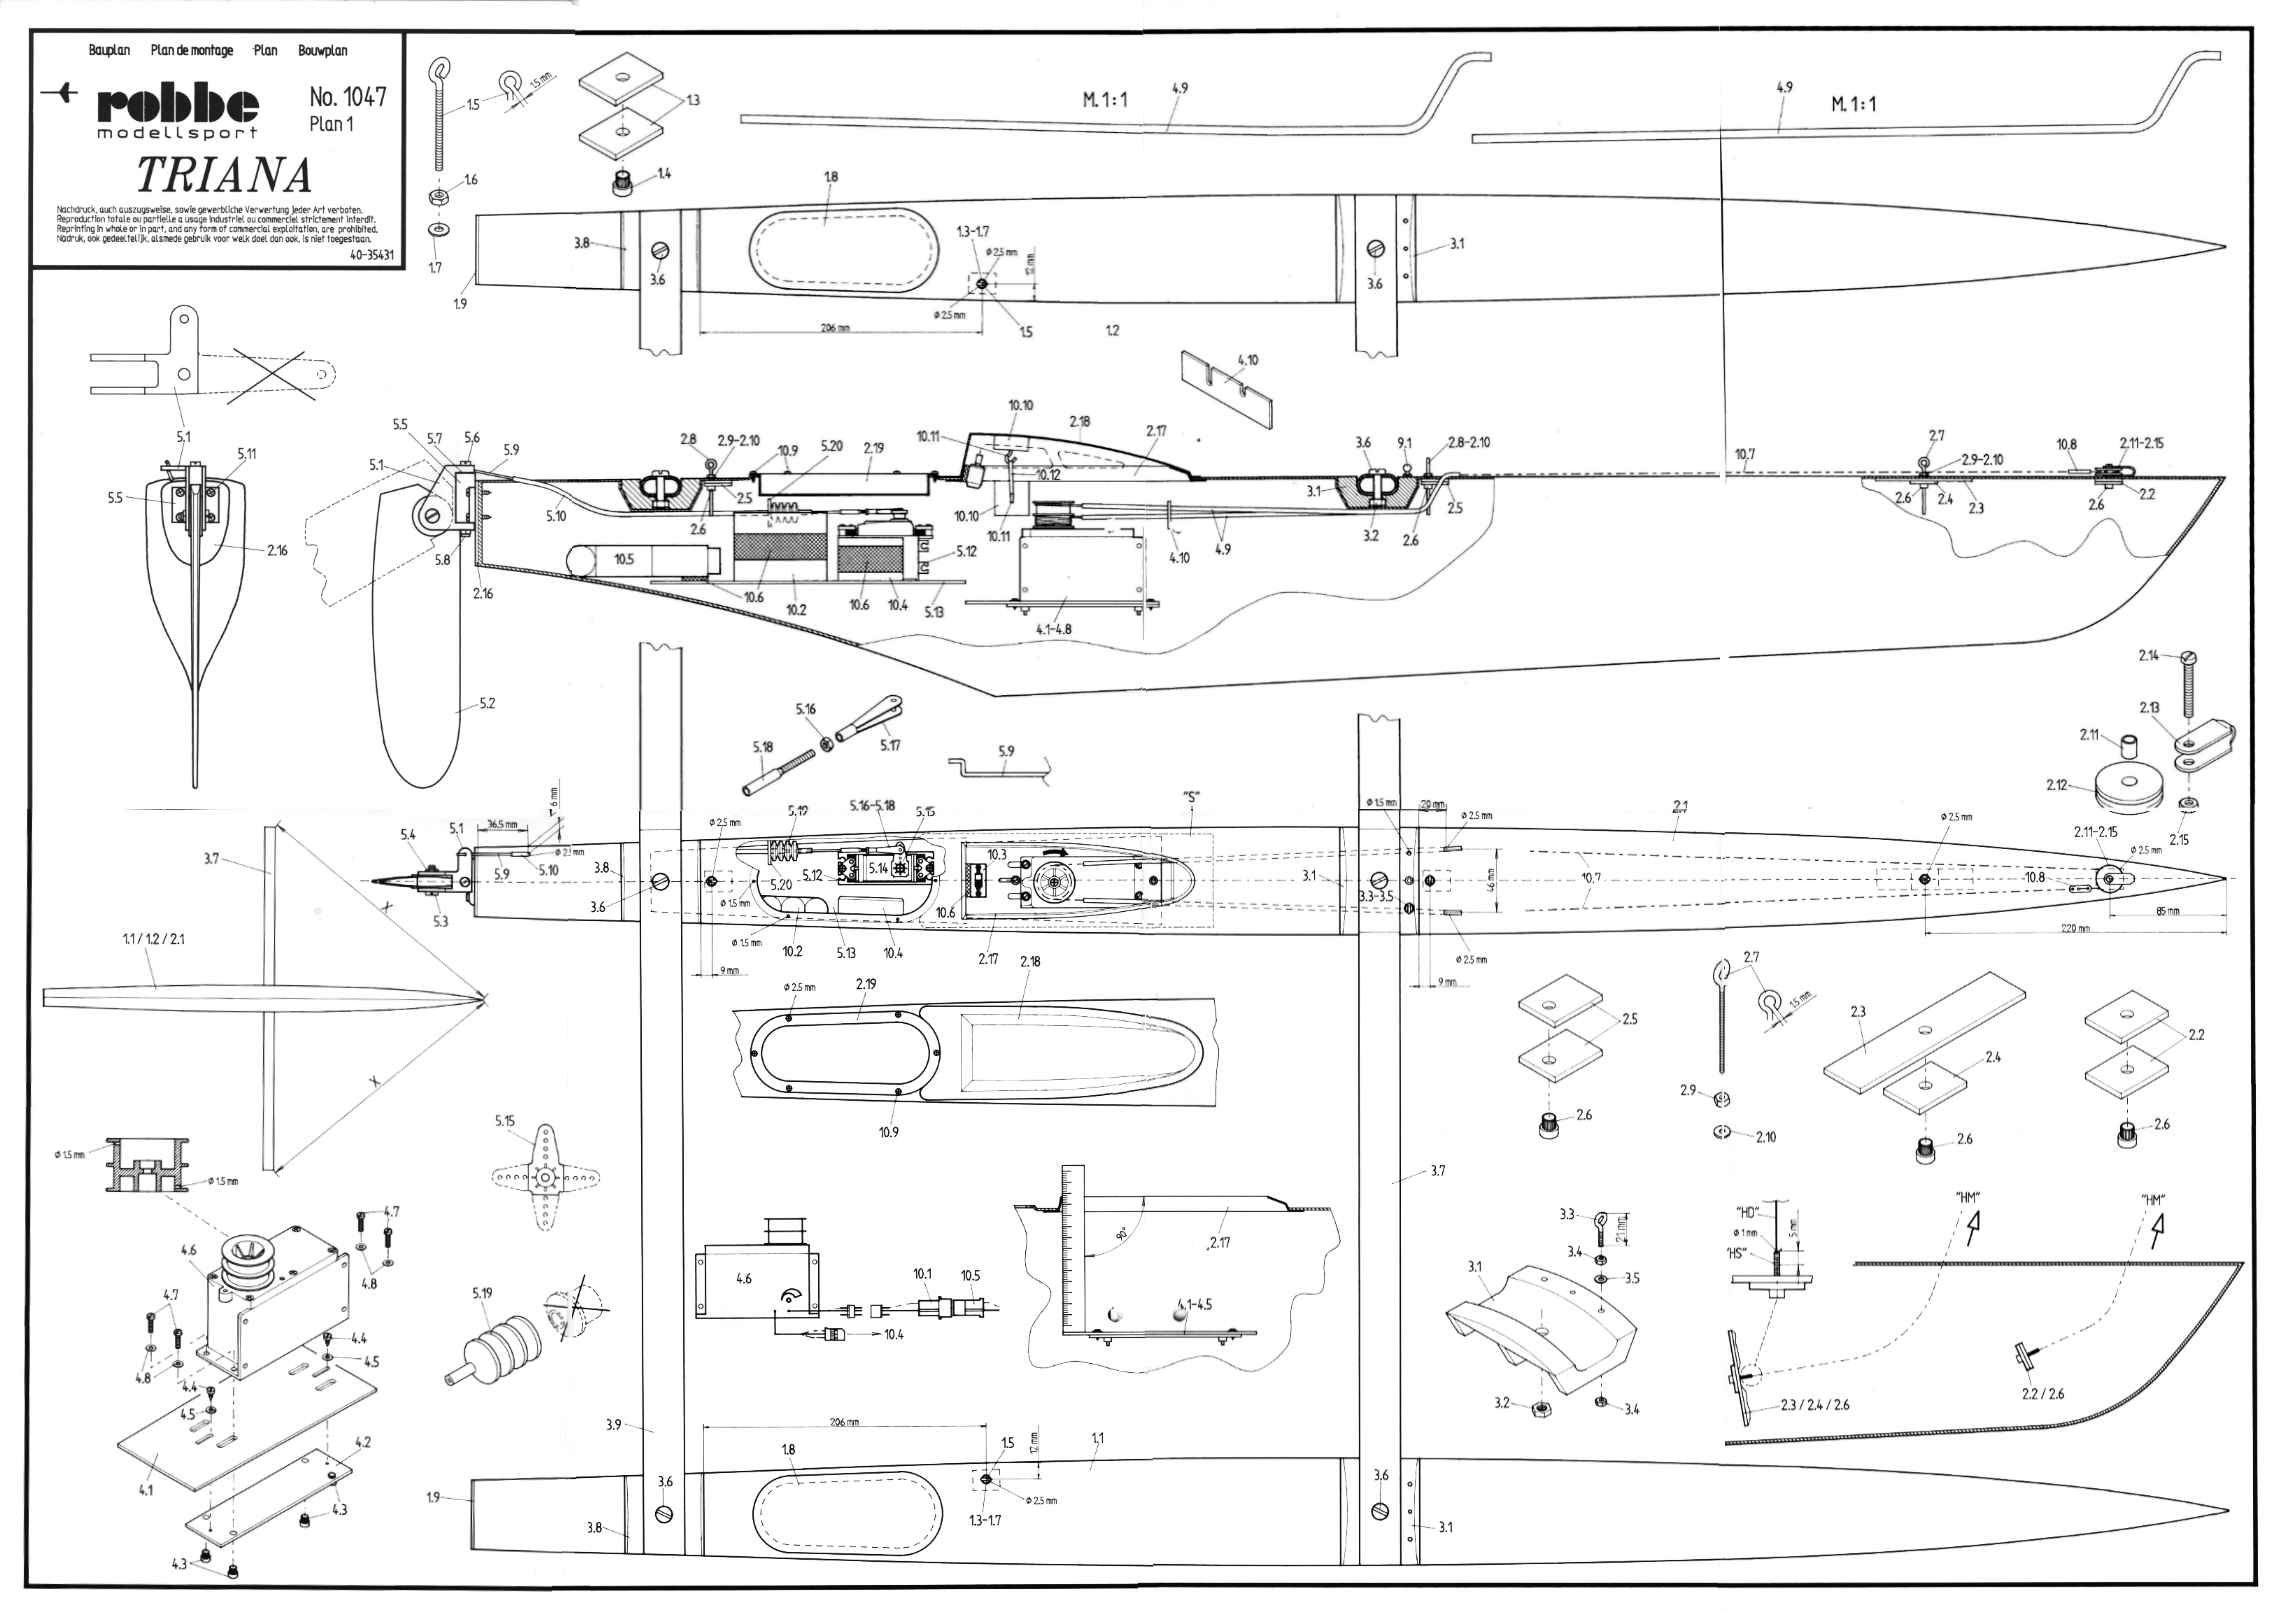 power catamaran rc boat building plans [ 2277 x 1614 Pixel ]